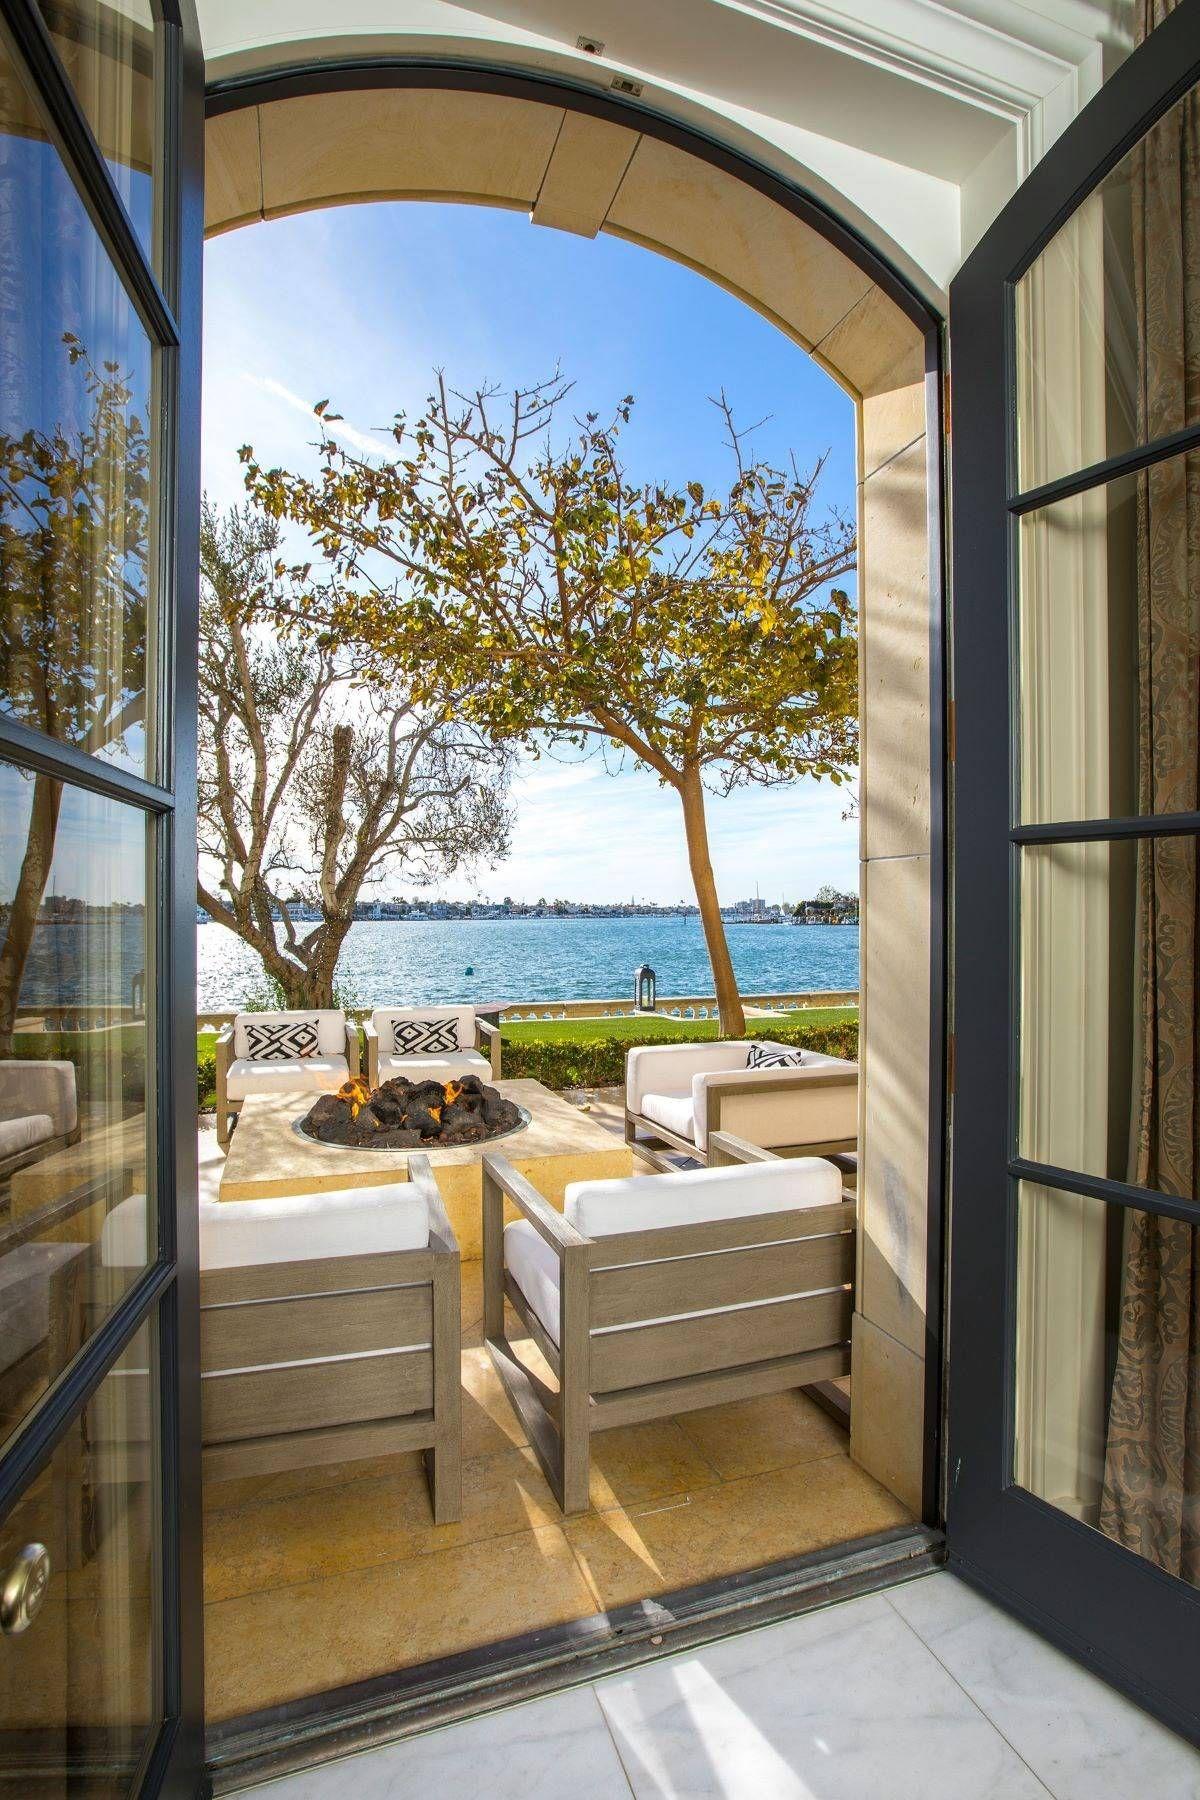 18 Harbor Island Newport Beach, California, United States – Luxury Home For  Sale